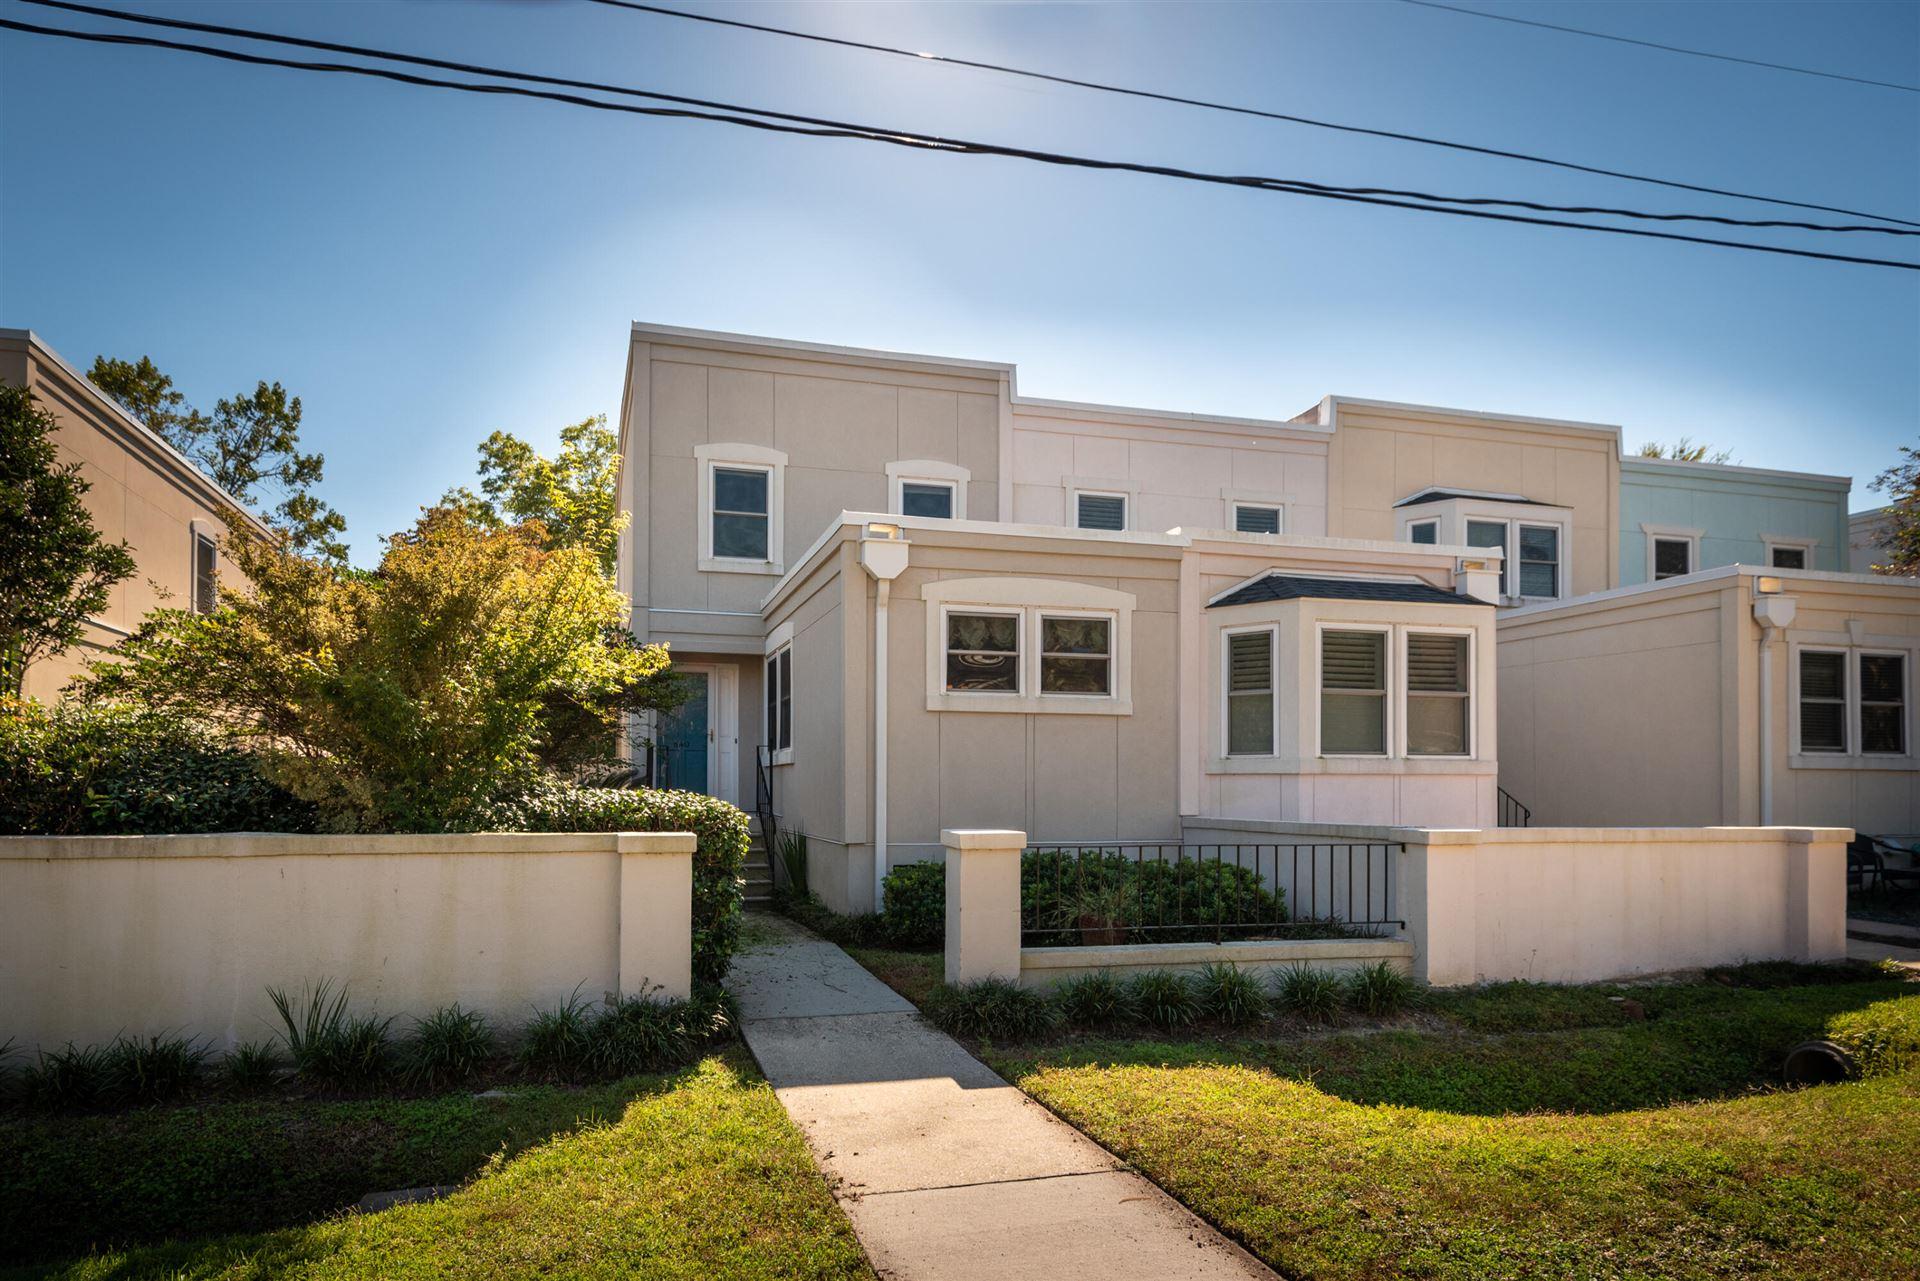 Photo of 840 Colony Drive, Charleston, SC 29407 (MLS # 21028605)